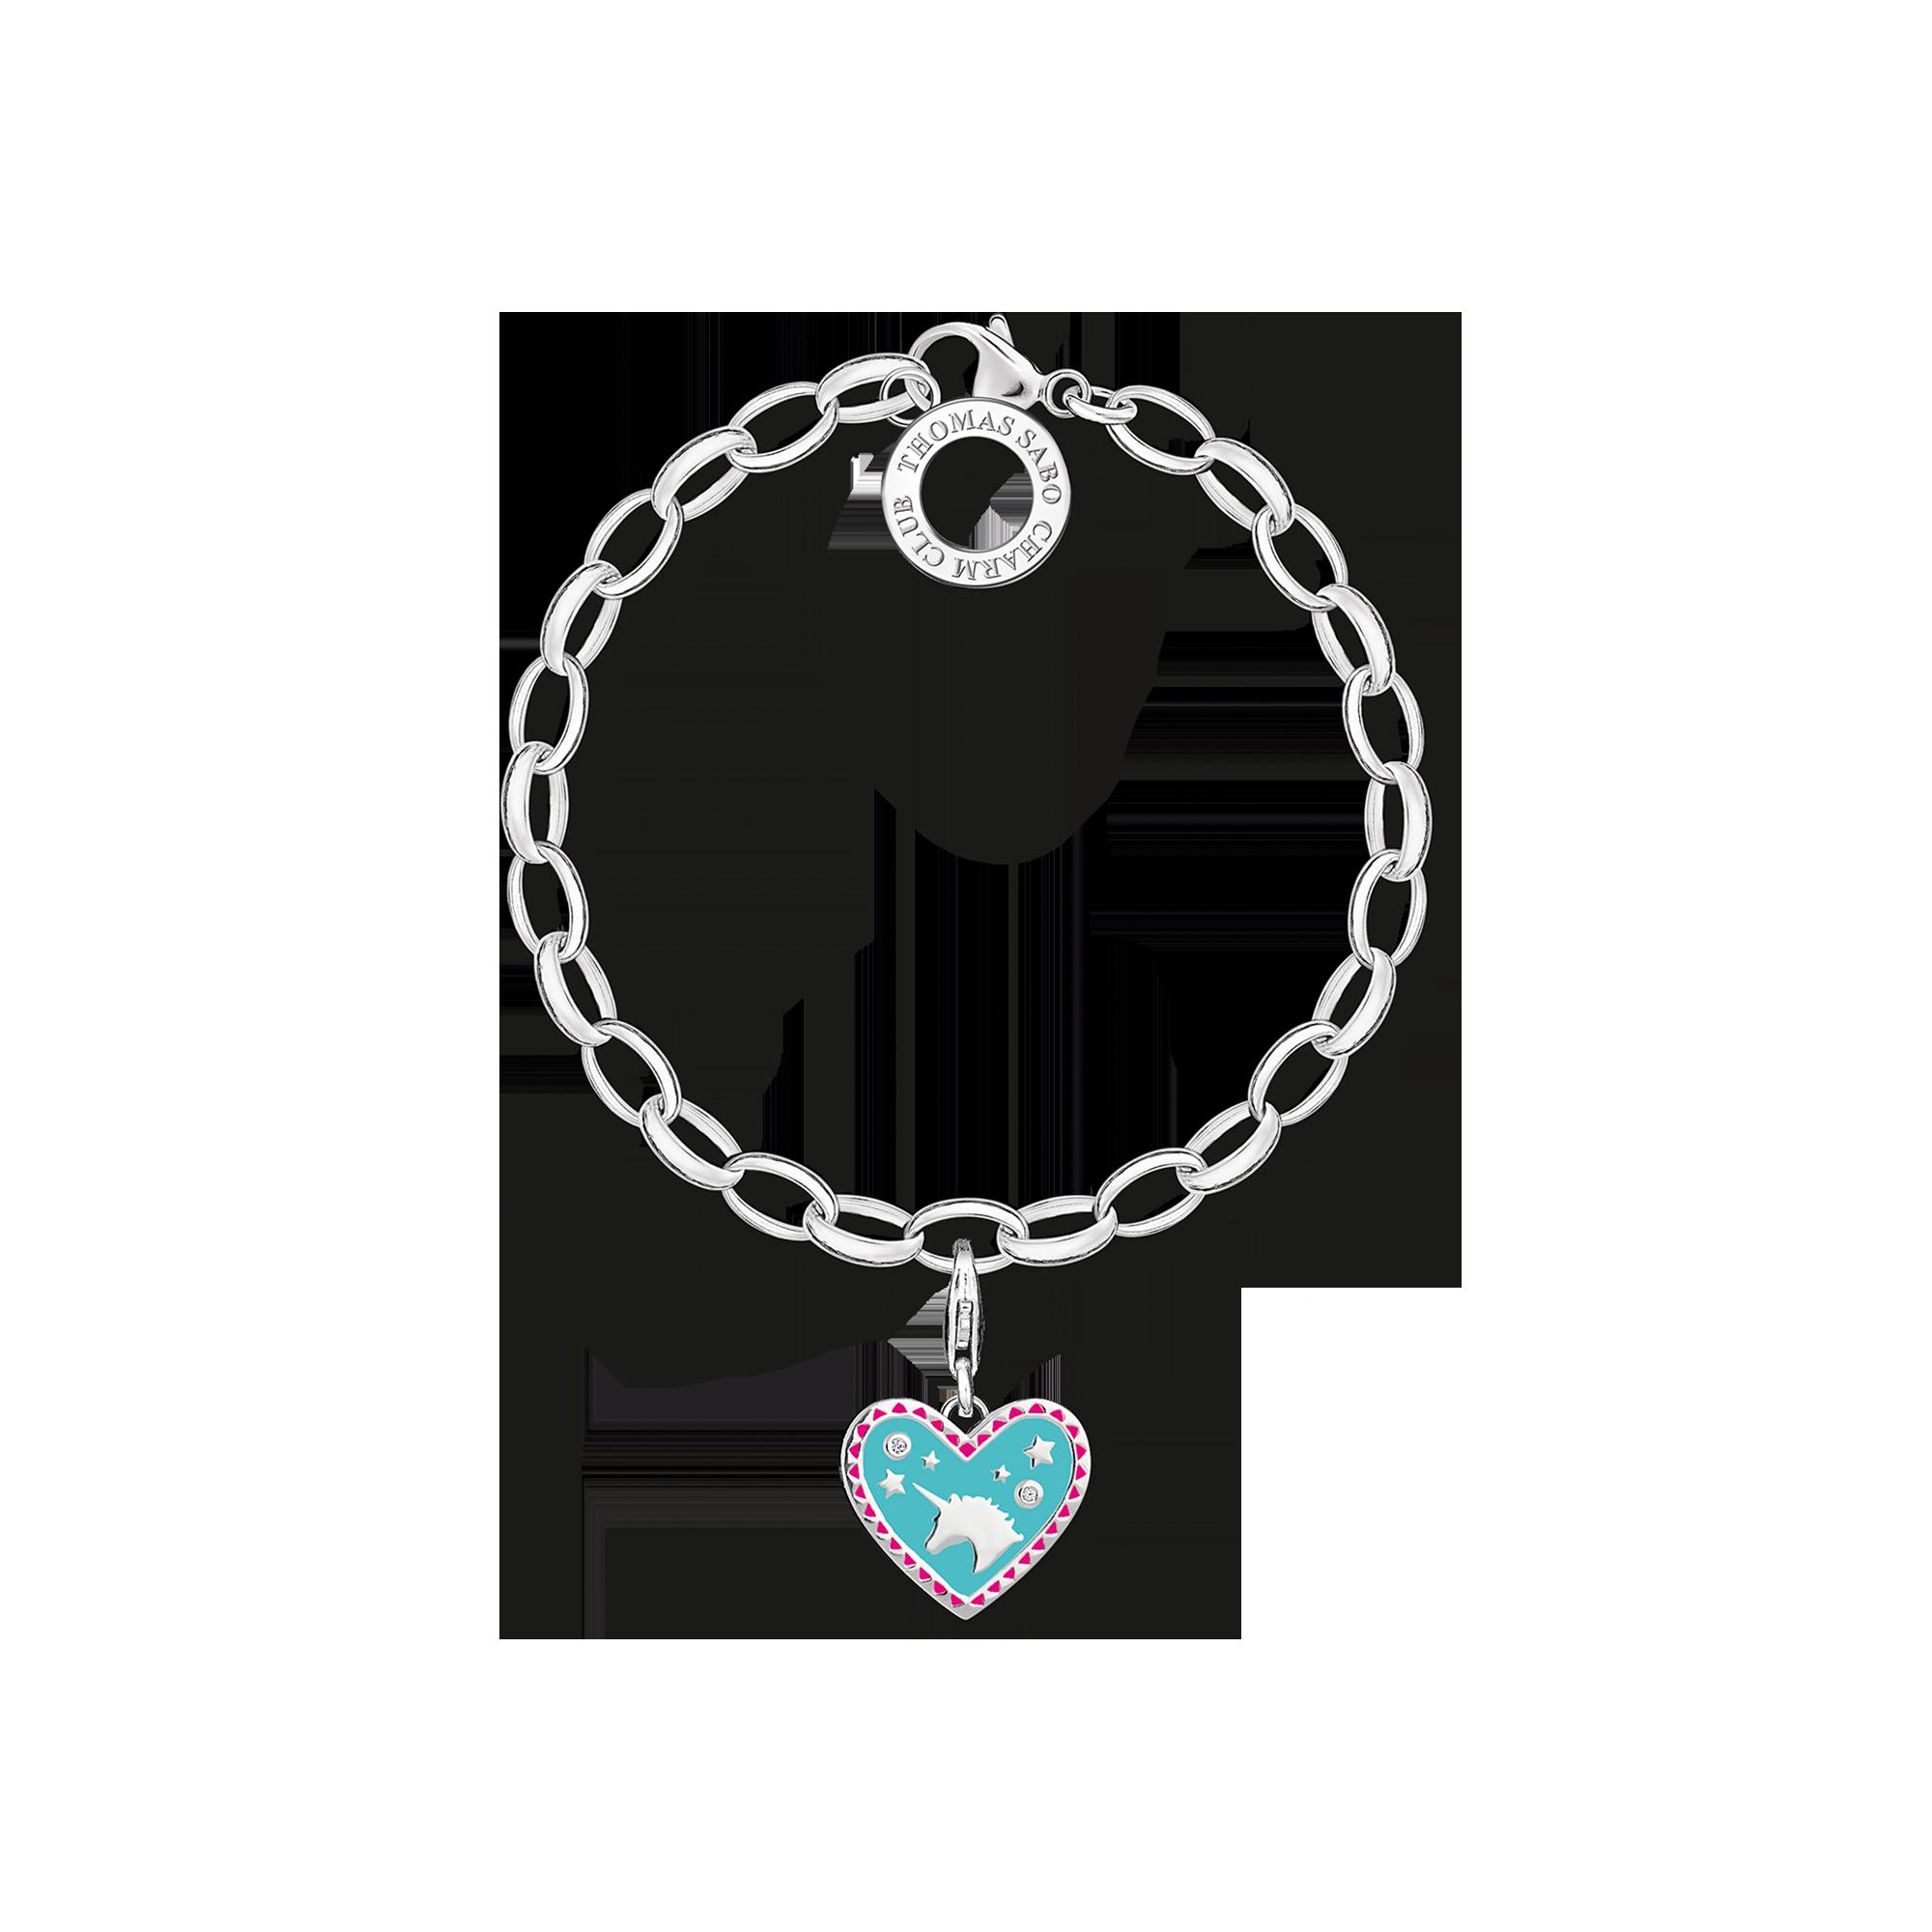 Thomas Sabo - Charm bracelet - 1